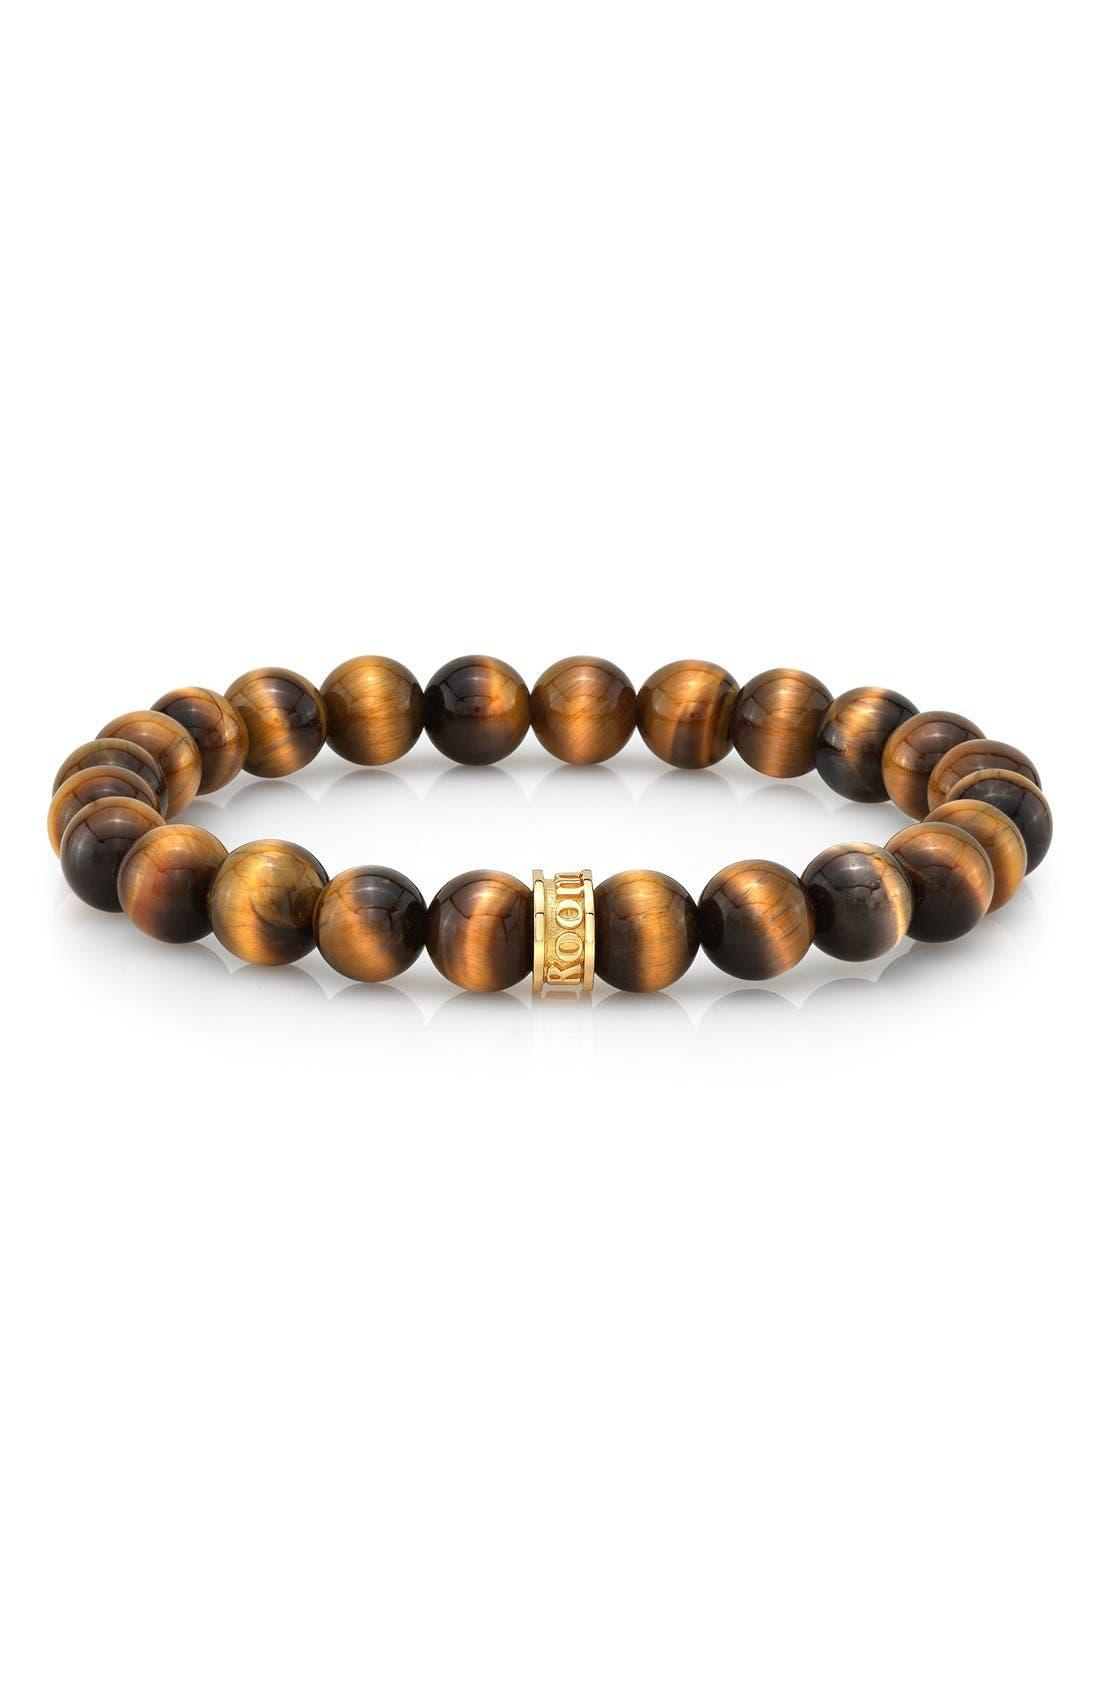 Main Image - Room101 Tiger's Eye Bead Bracelet